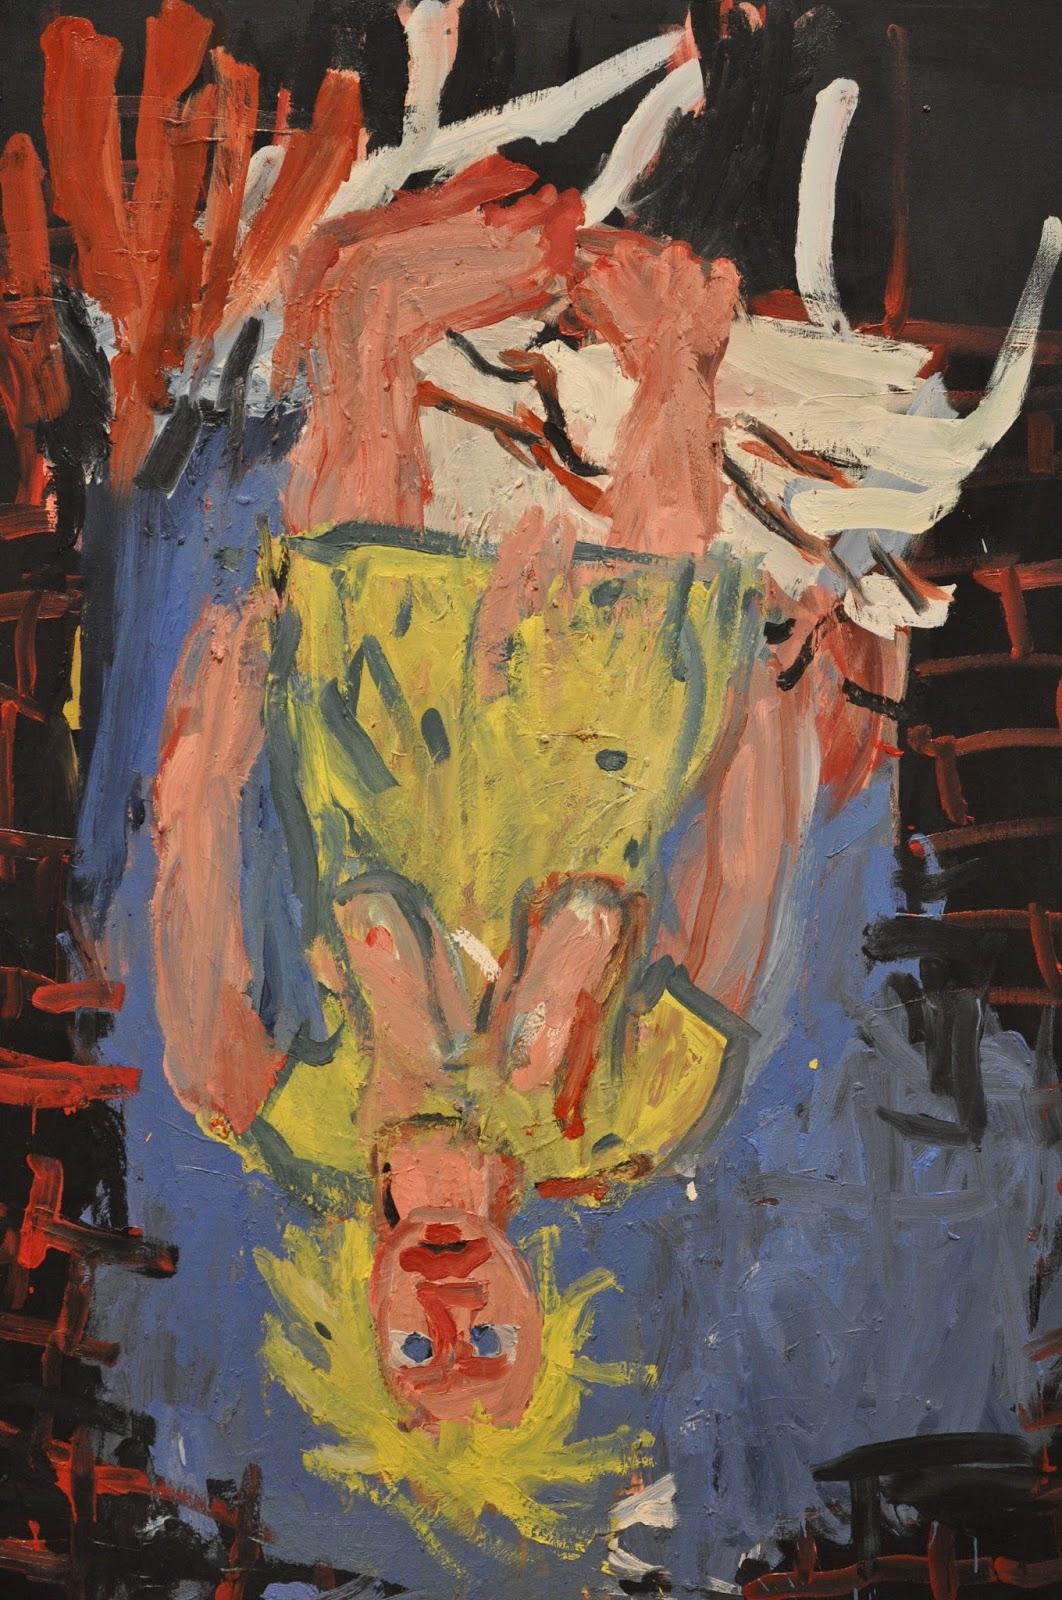 Joe For Oil >> iolanda andrade: Joe Berardo 's Art collection - temporary ...